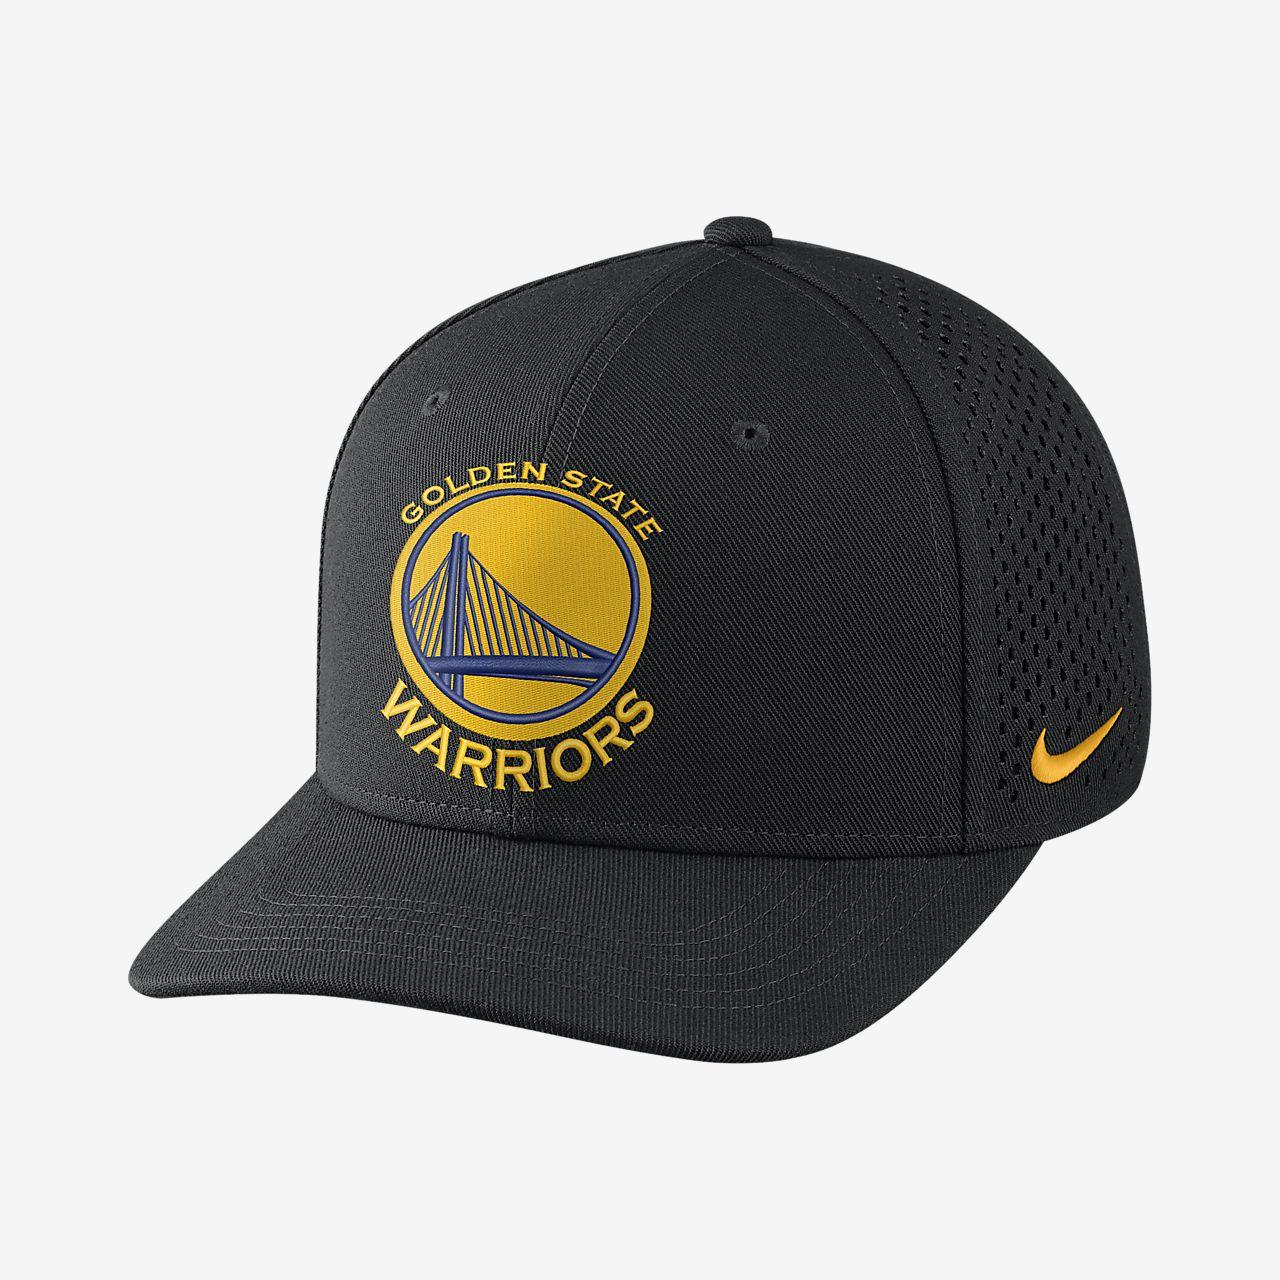 Golden State Warriors Nike AeroBill Classic99 中性可調式 NBA 帽款